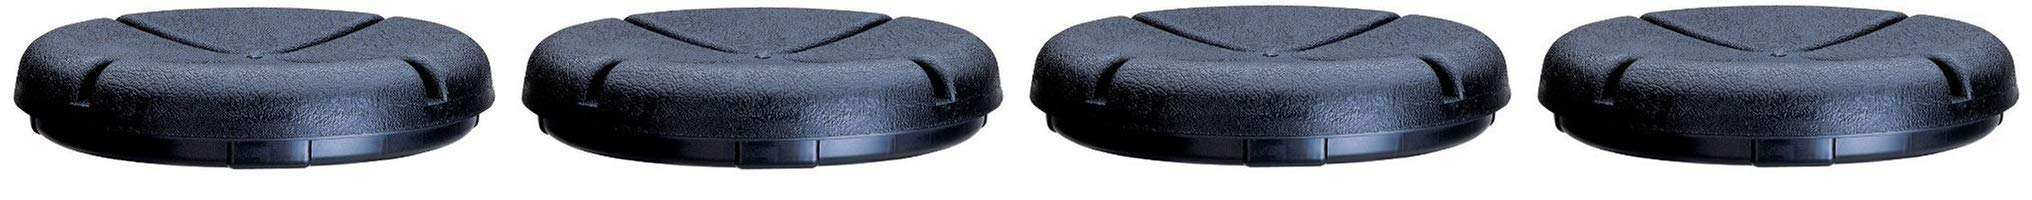 Custom Leathercraft CLC 1140 EasySeat Lightweight Plastic Bucket Seat for 3 1/2-5 Gallon Buckets (Fоur Paсk)